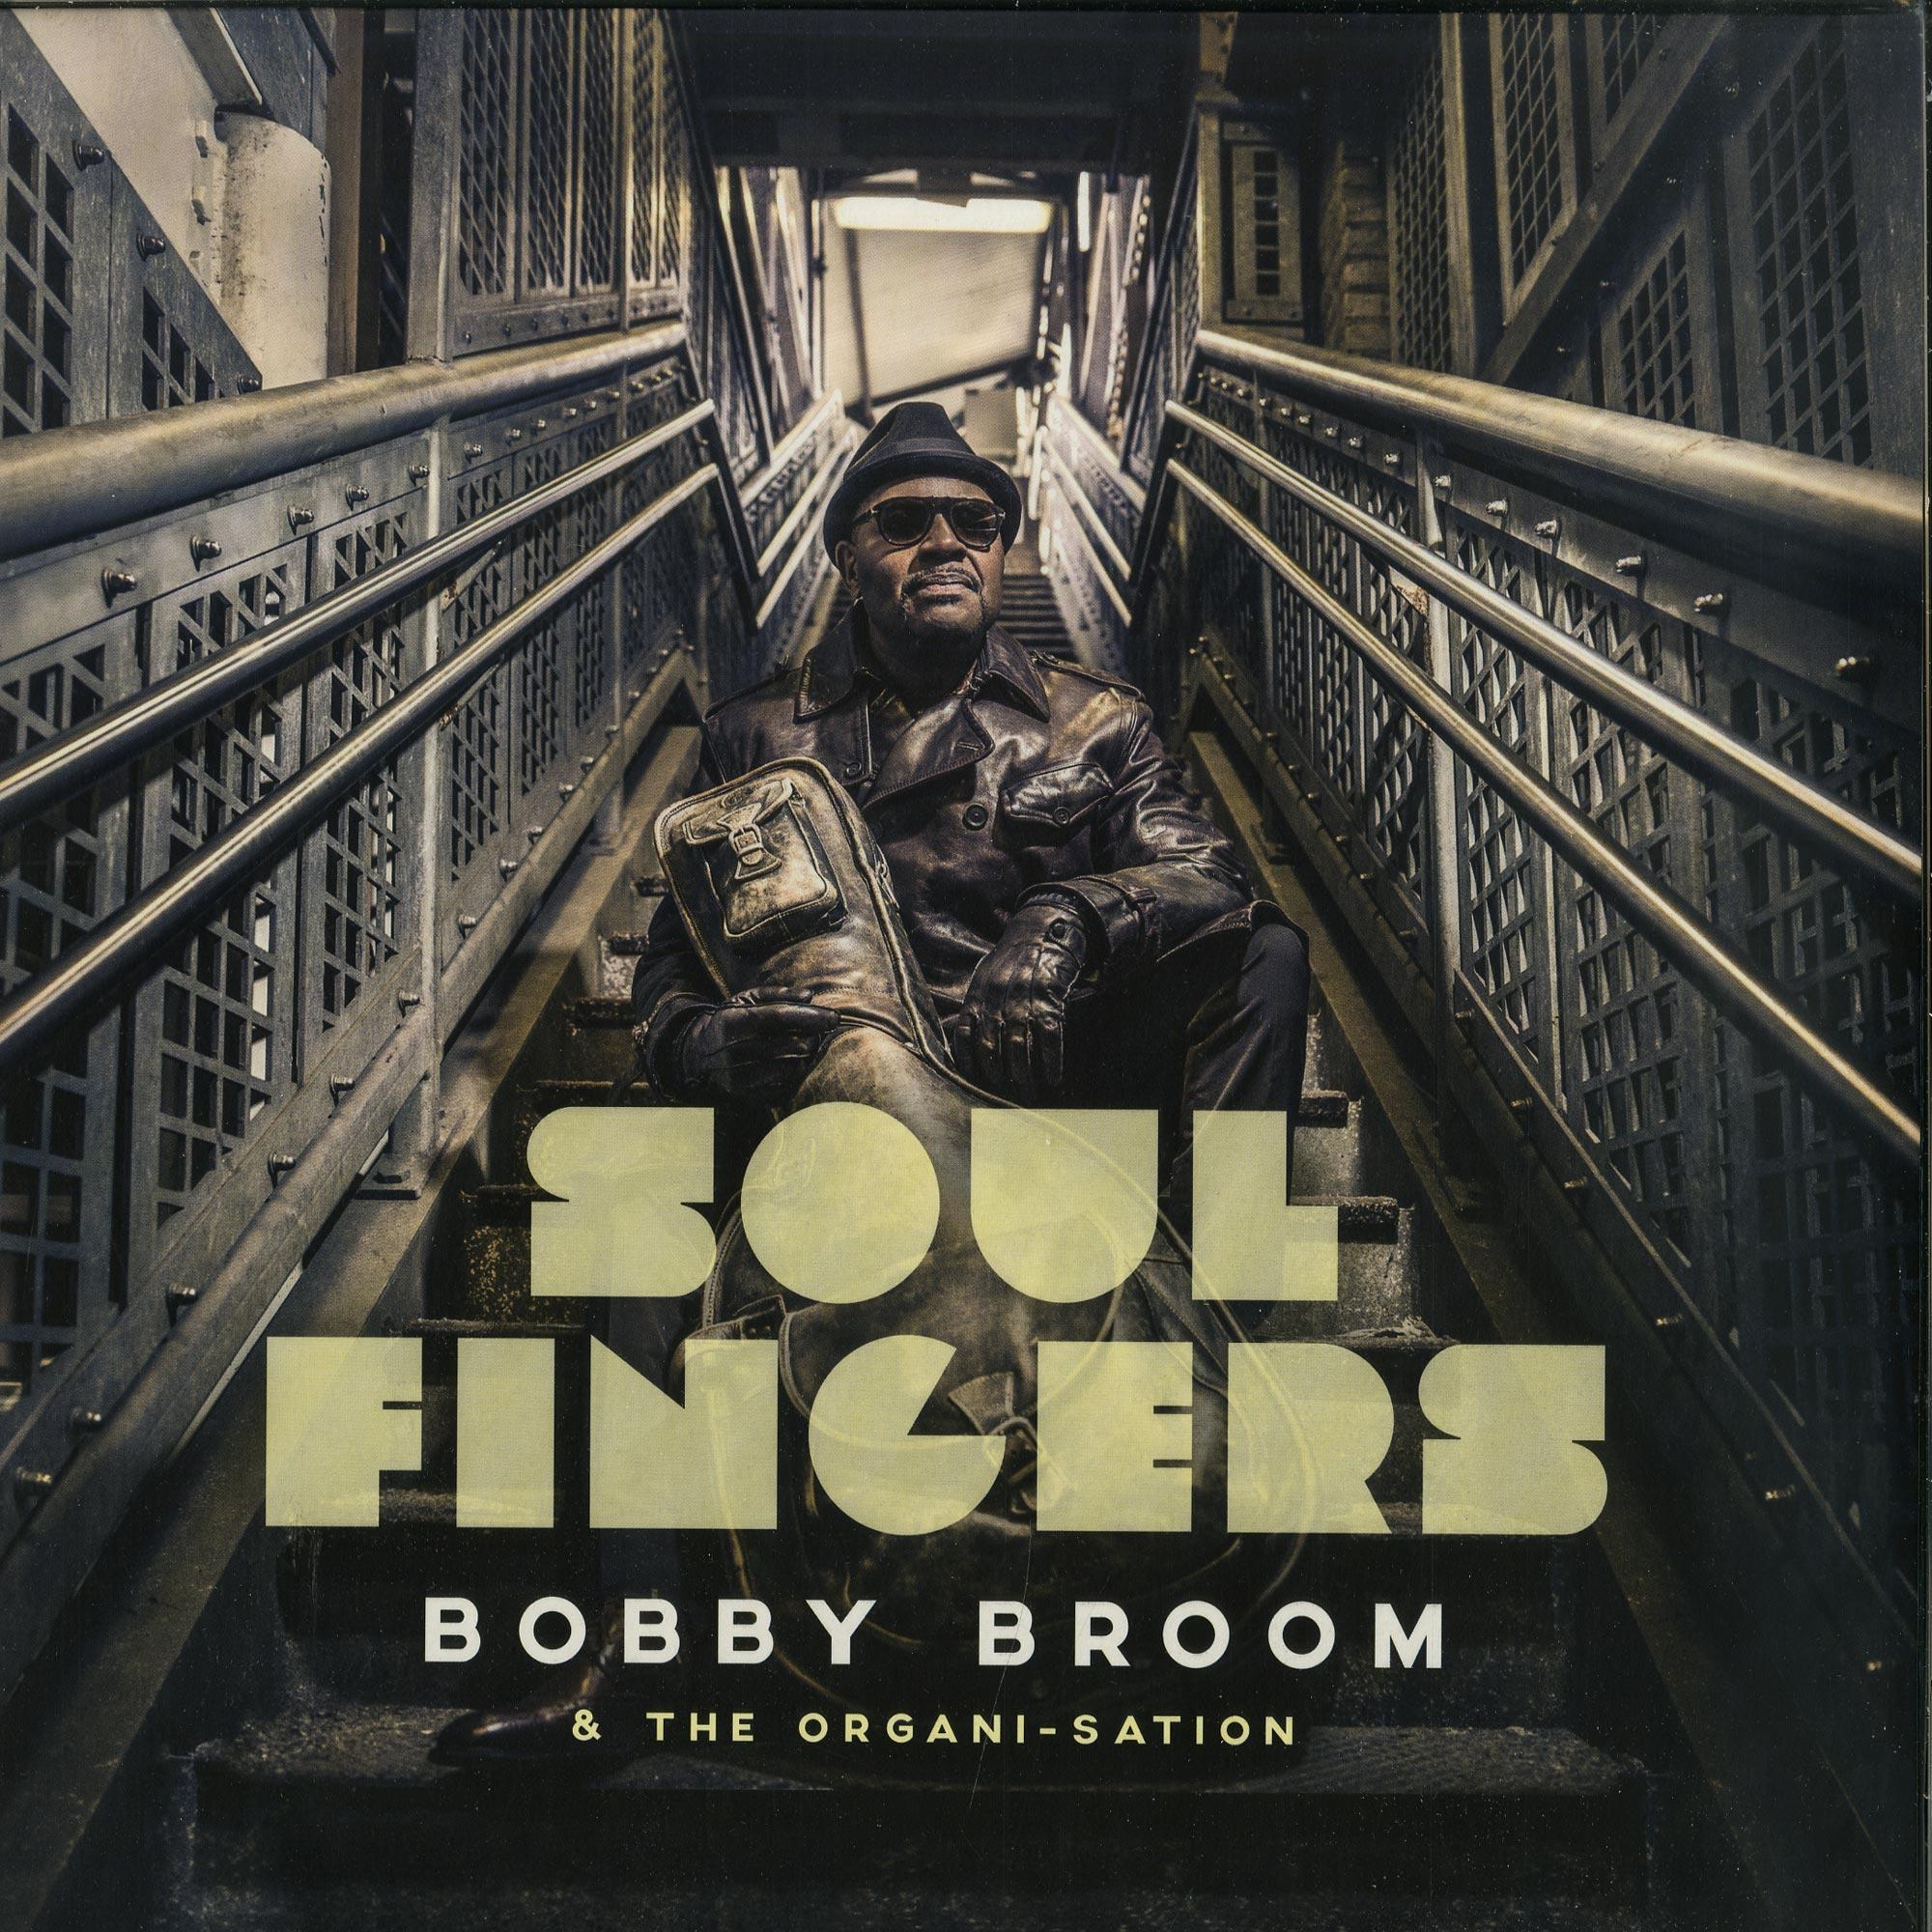 Bobby Broom & The Organi-Sation - SOUL FINGERS